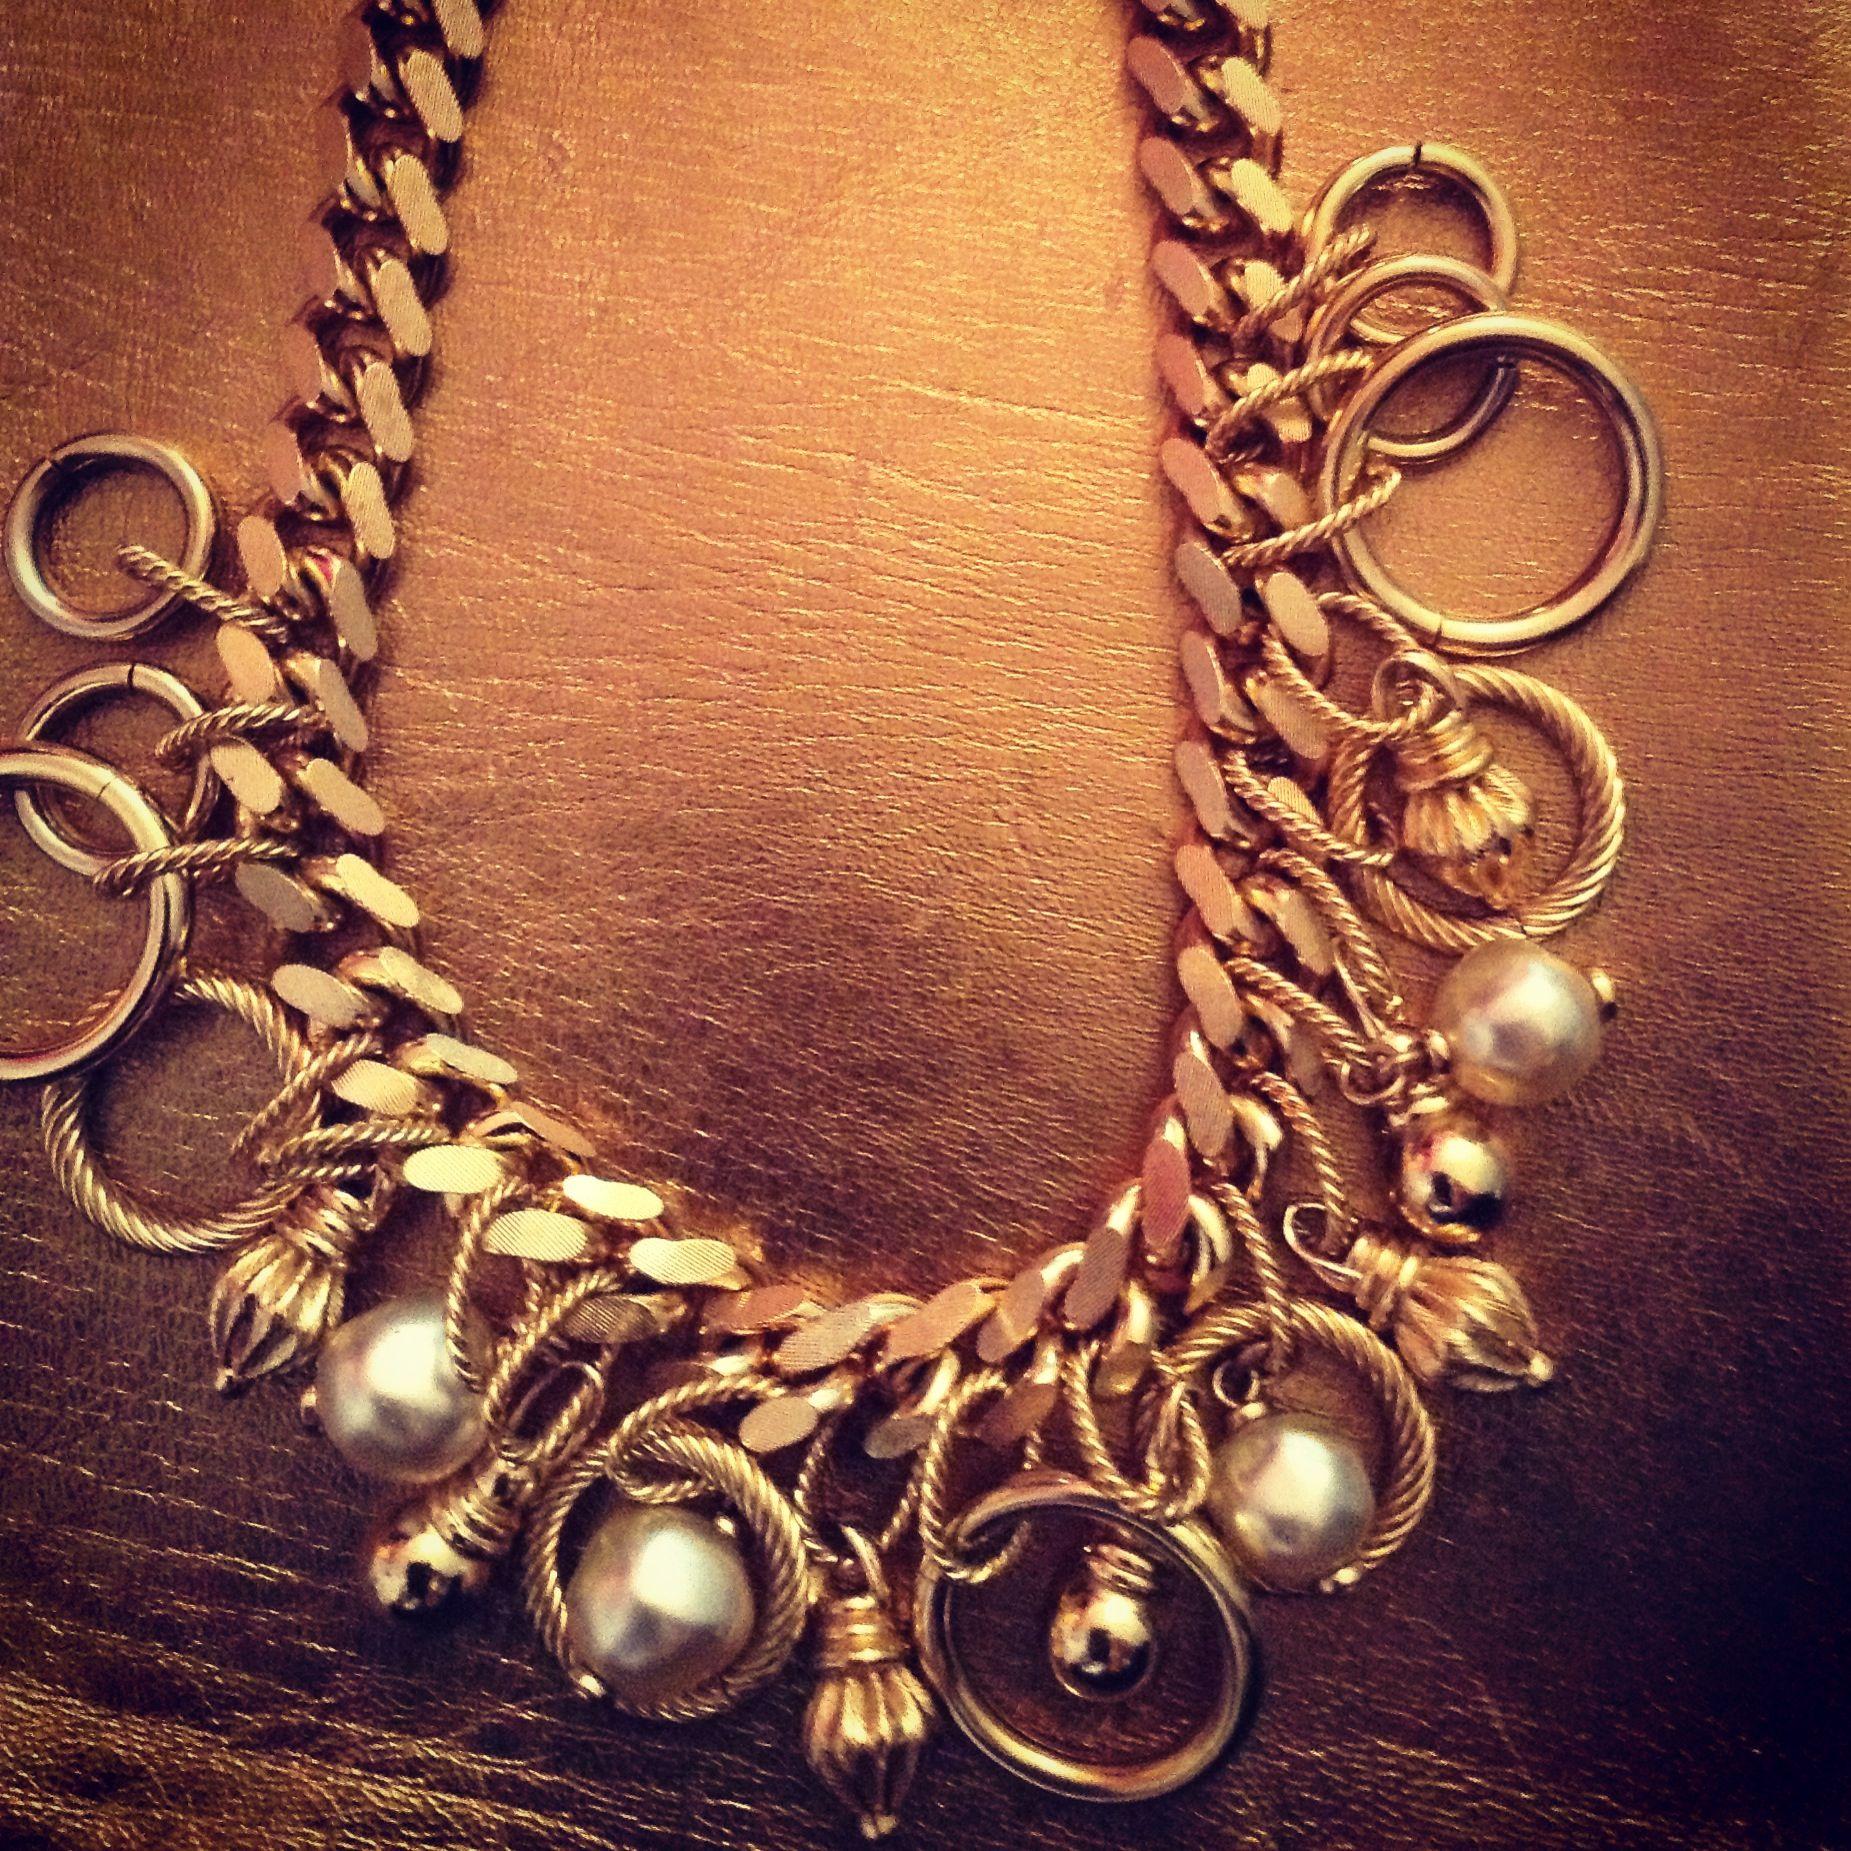 Dior Vintage Jewelry 116